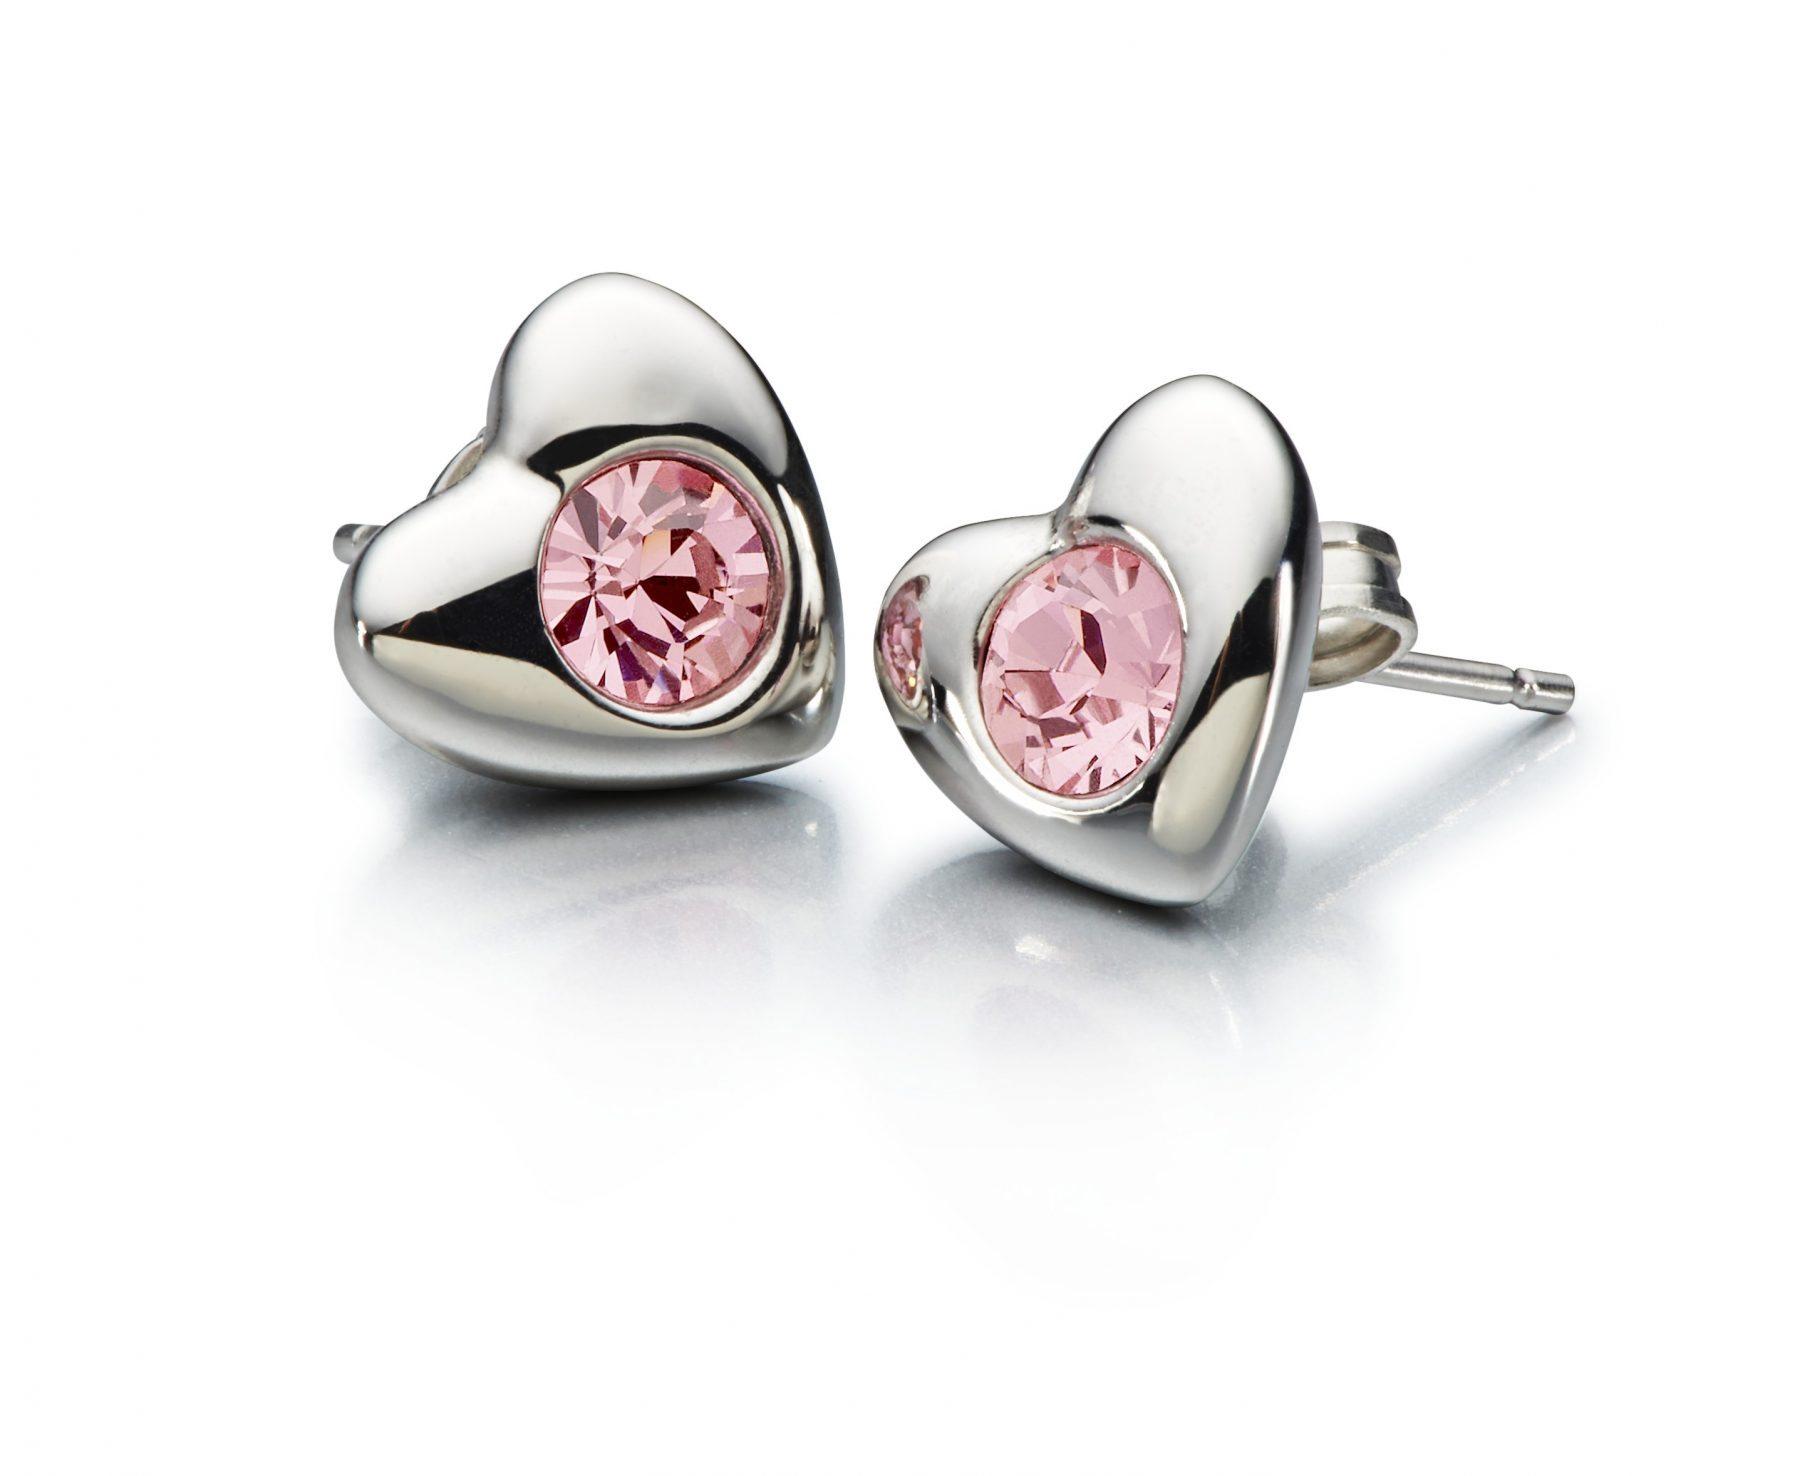 Chamilia Radiant Heart Earrings-Pink Swarovski